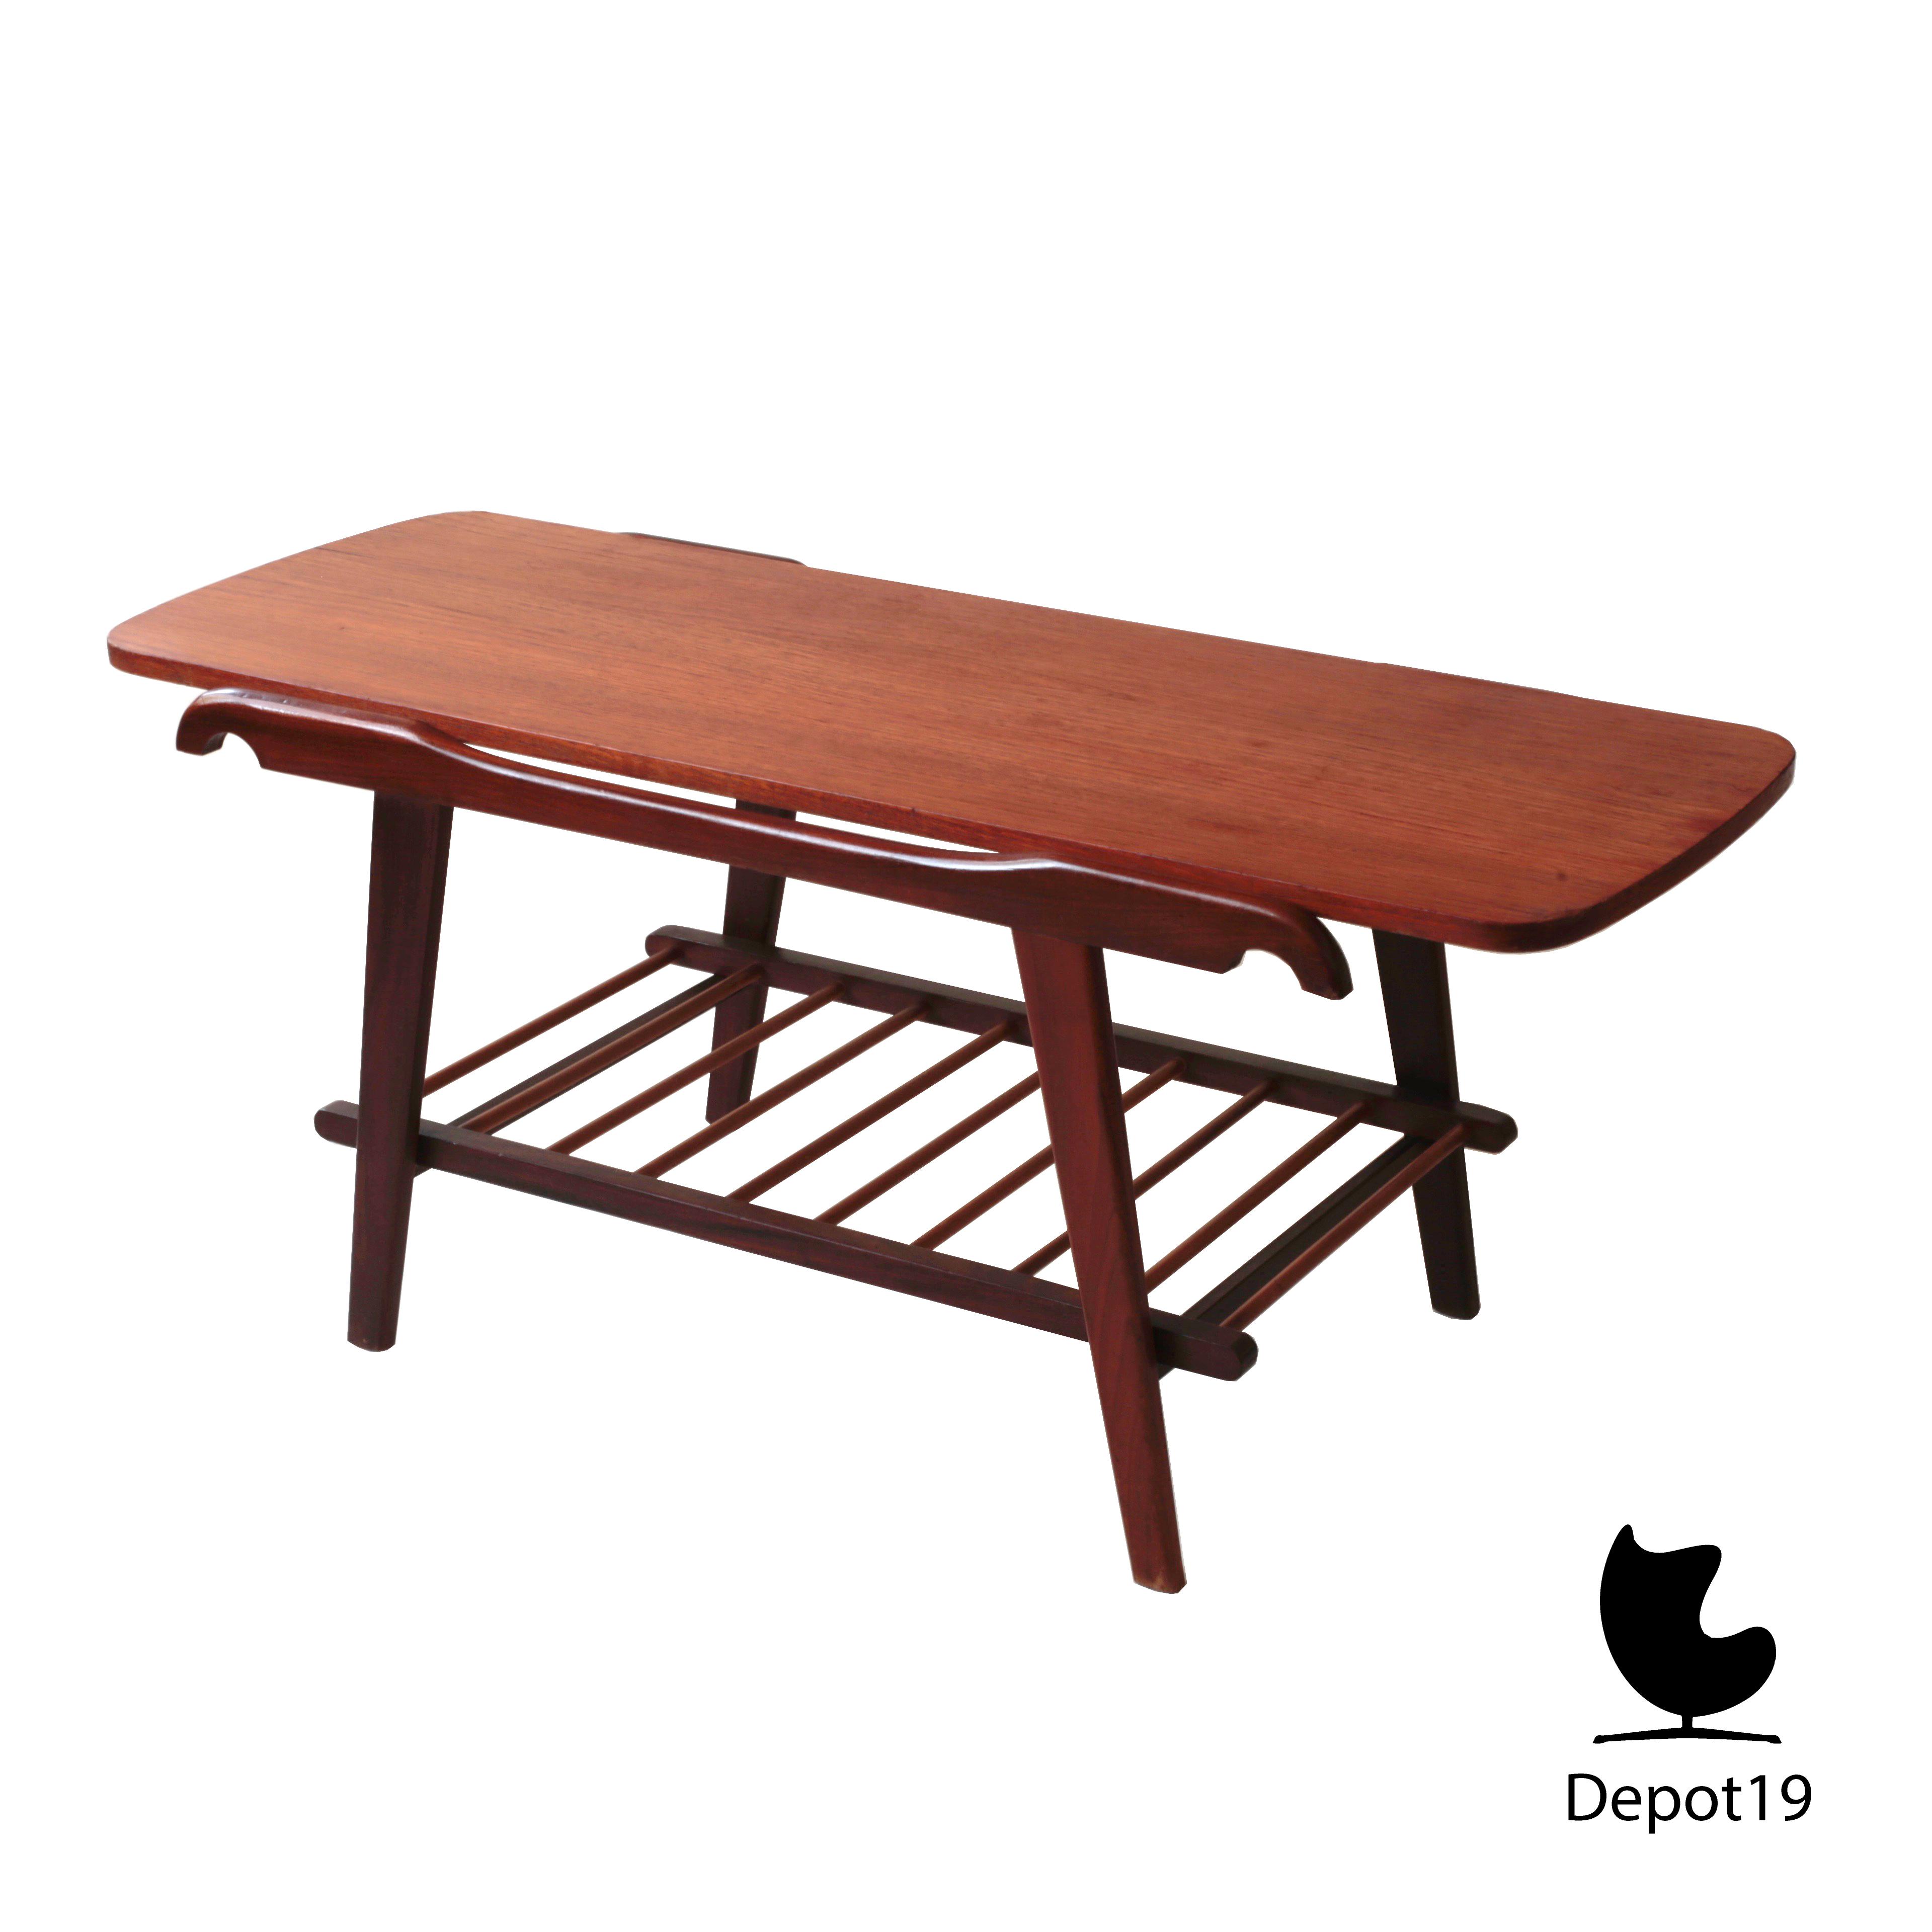 Louis van teeffelen style coffee table organic depot 19 for 60s style coffee table